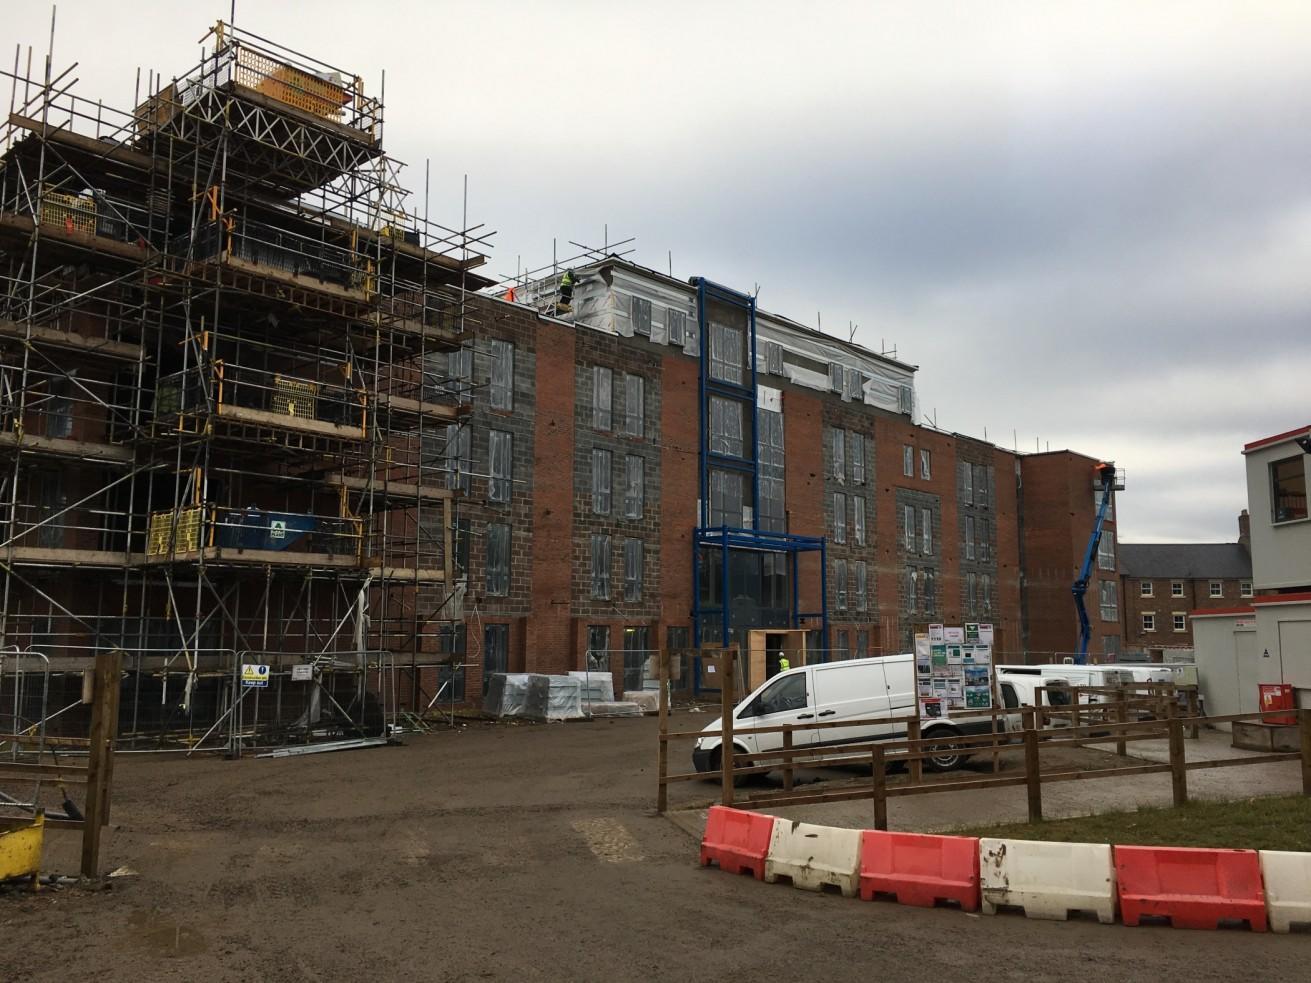 Sheraton Park-New build Sheraton House